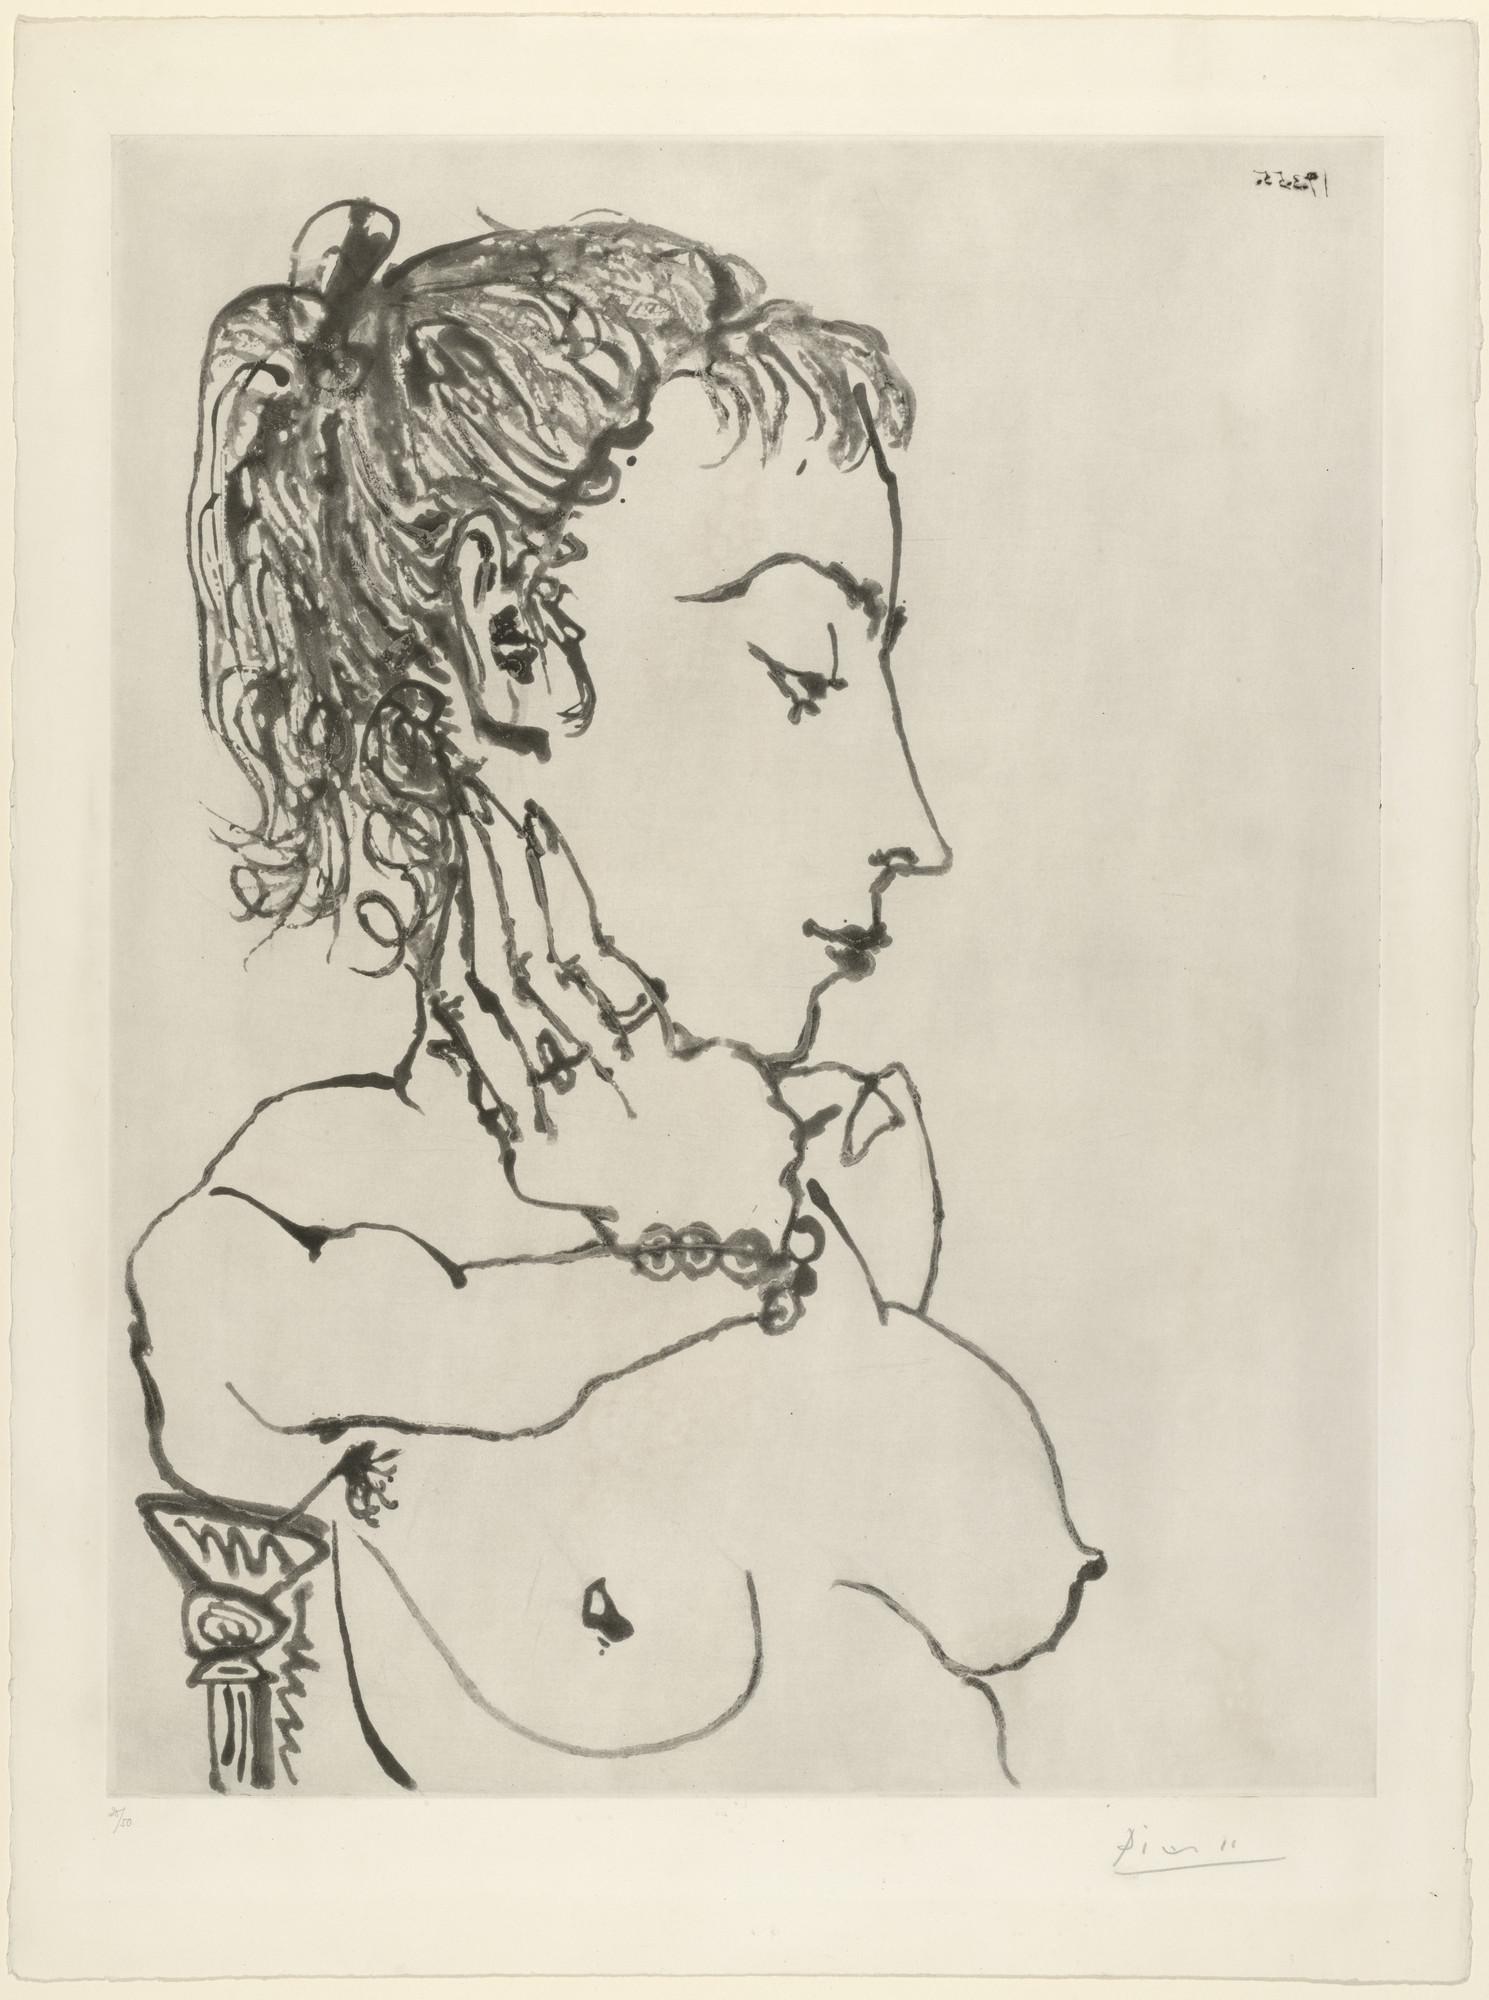 Pablo Picasso. Bust of a Woman with Ponytail: Jacqueline (Buste de ...